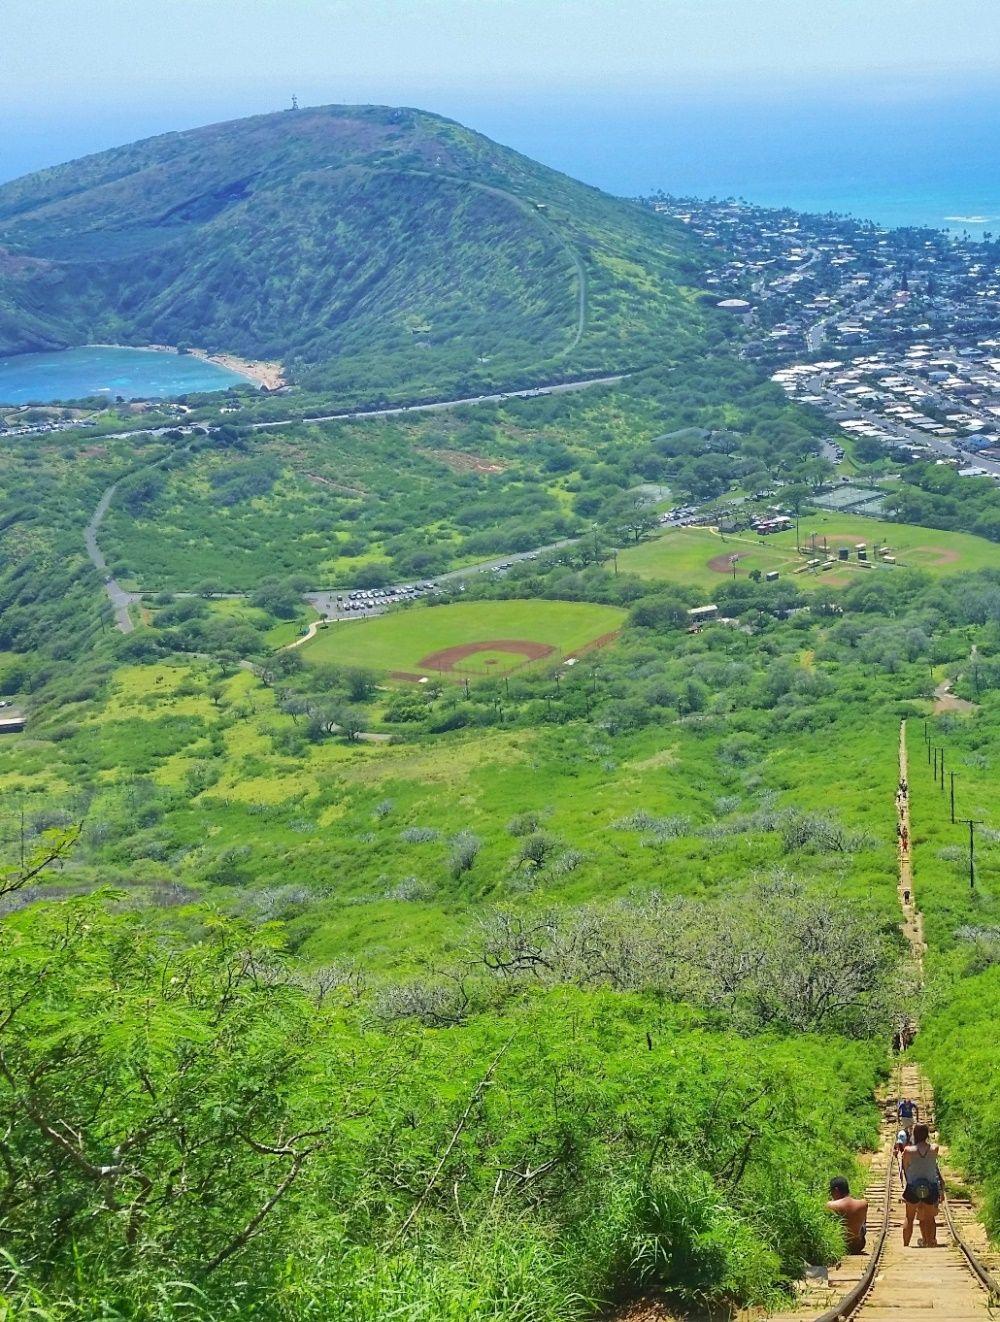 Oahu Hikes: map + list :: Best hiking trails on Oahu :: oahu hawaii on mount thielsen trail map, koko crater trail map, kaena point trail map, hanalei trail map, hanauma bay trail map, waimea trail map, kihei trail map, hawaii map, tantalus trail map,